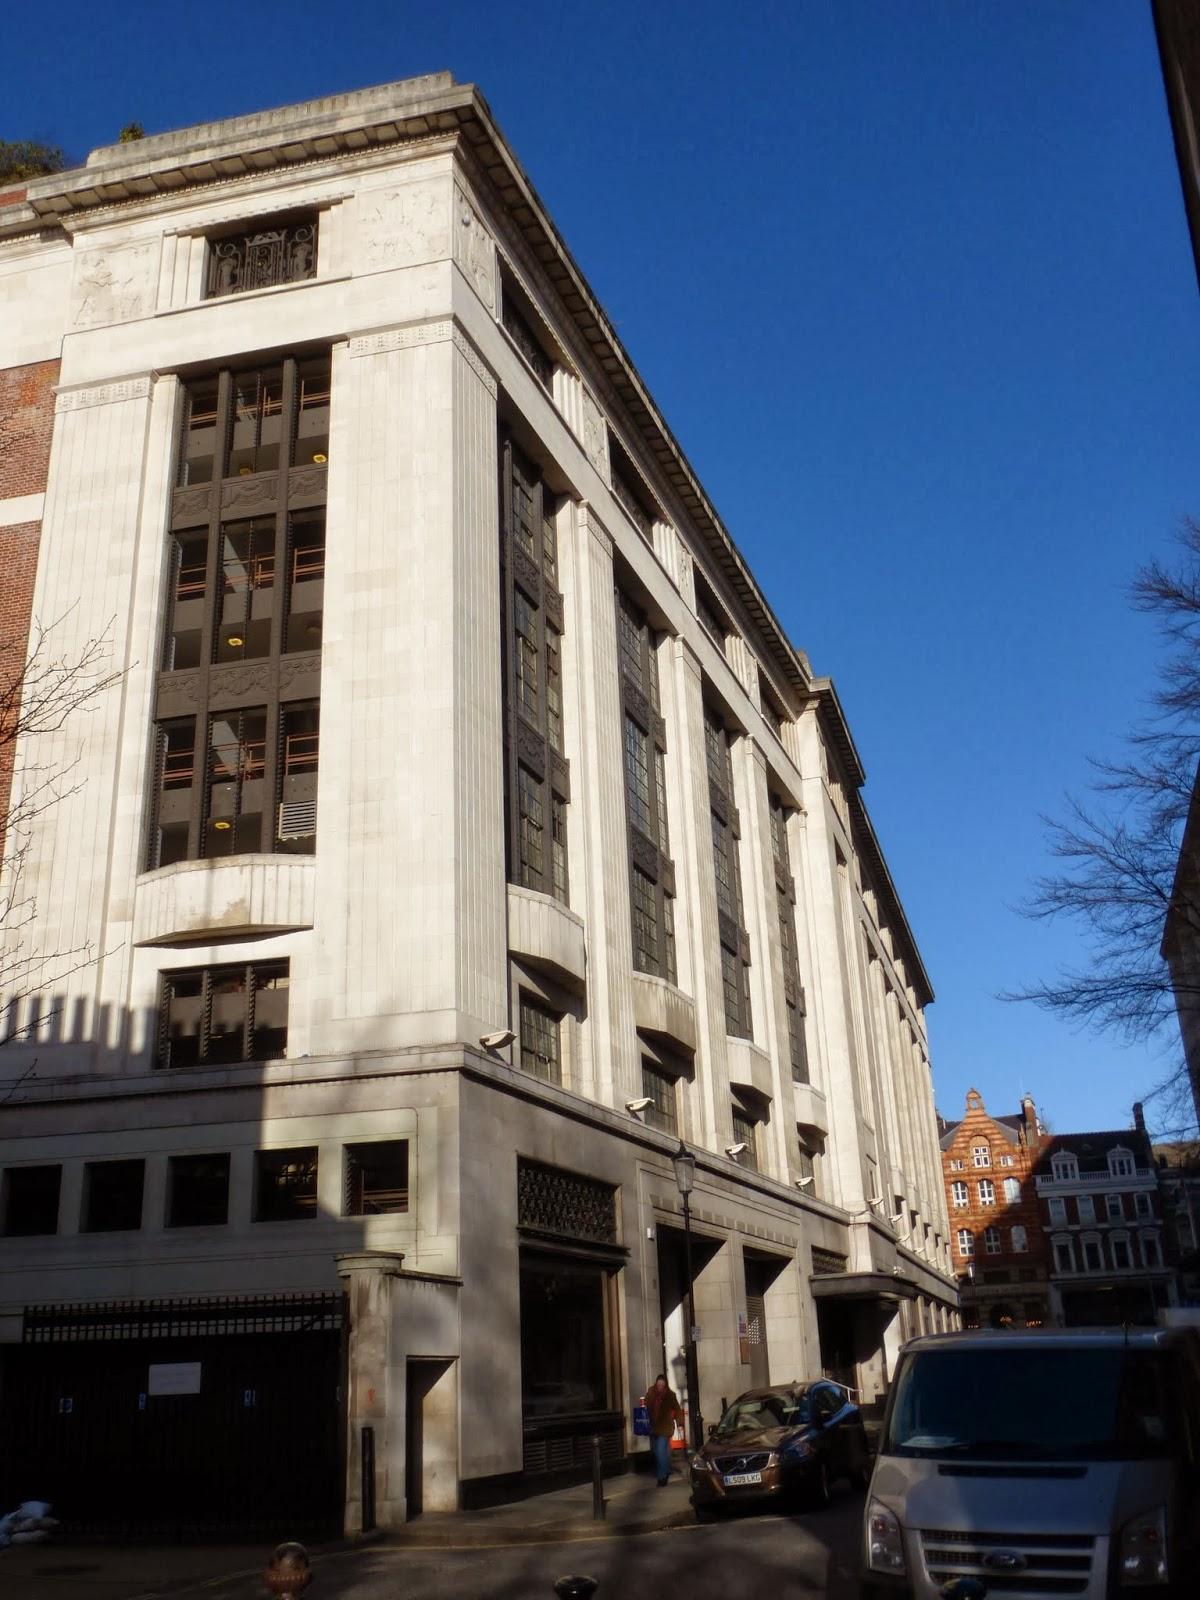 99 Kesnsington High Street Which Has The Kensington Roof Gardens